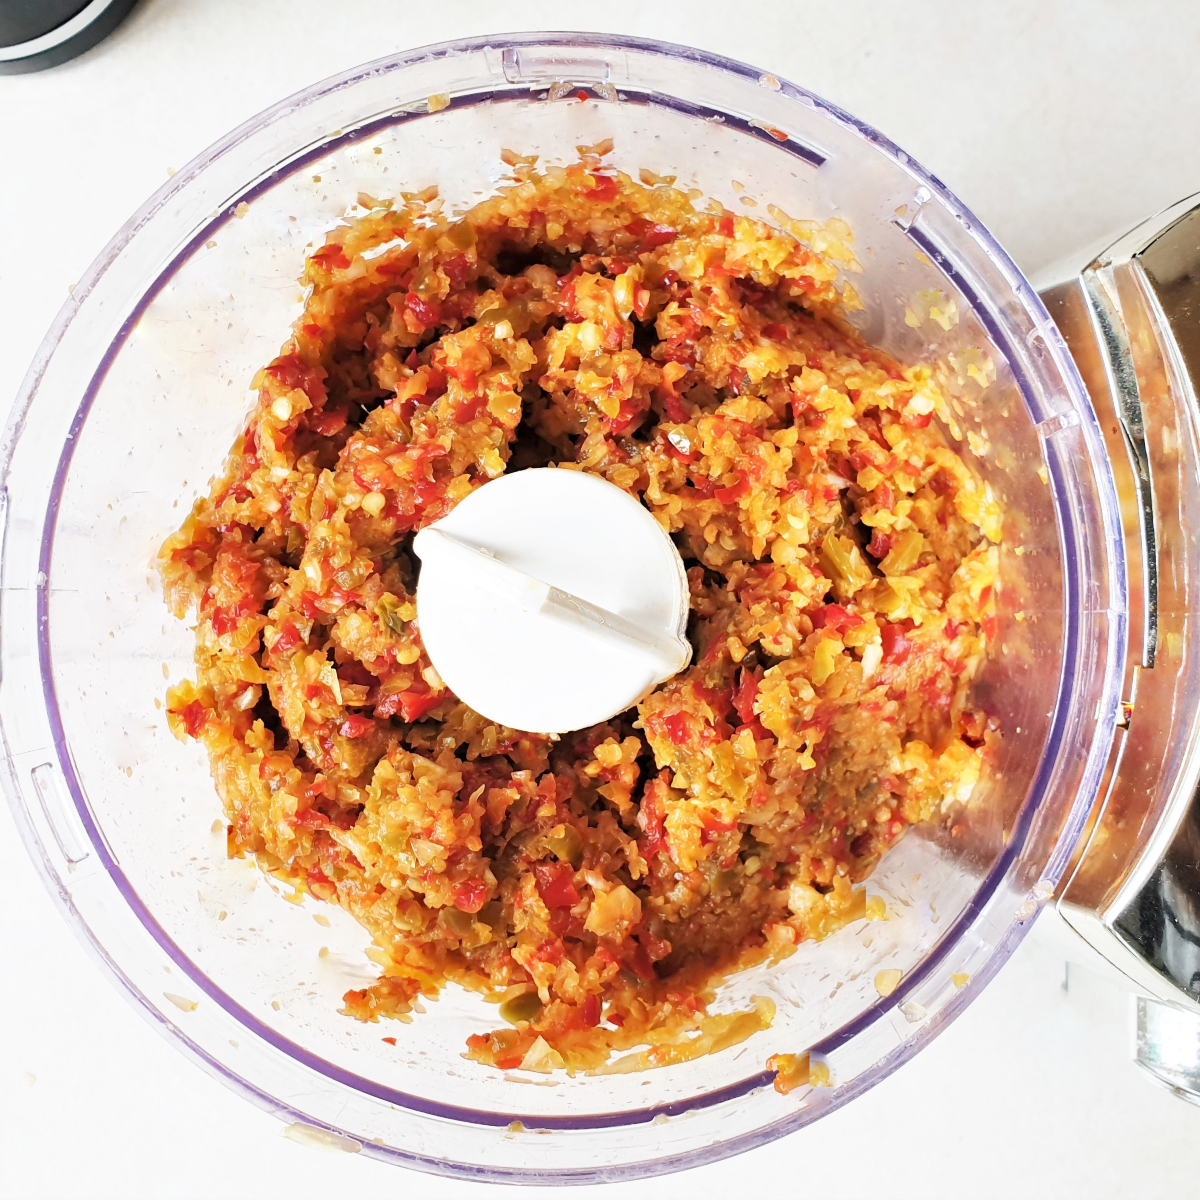 Chili, onion and garlic in a food processor.